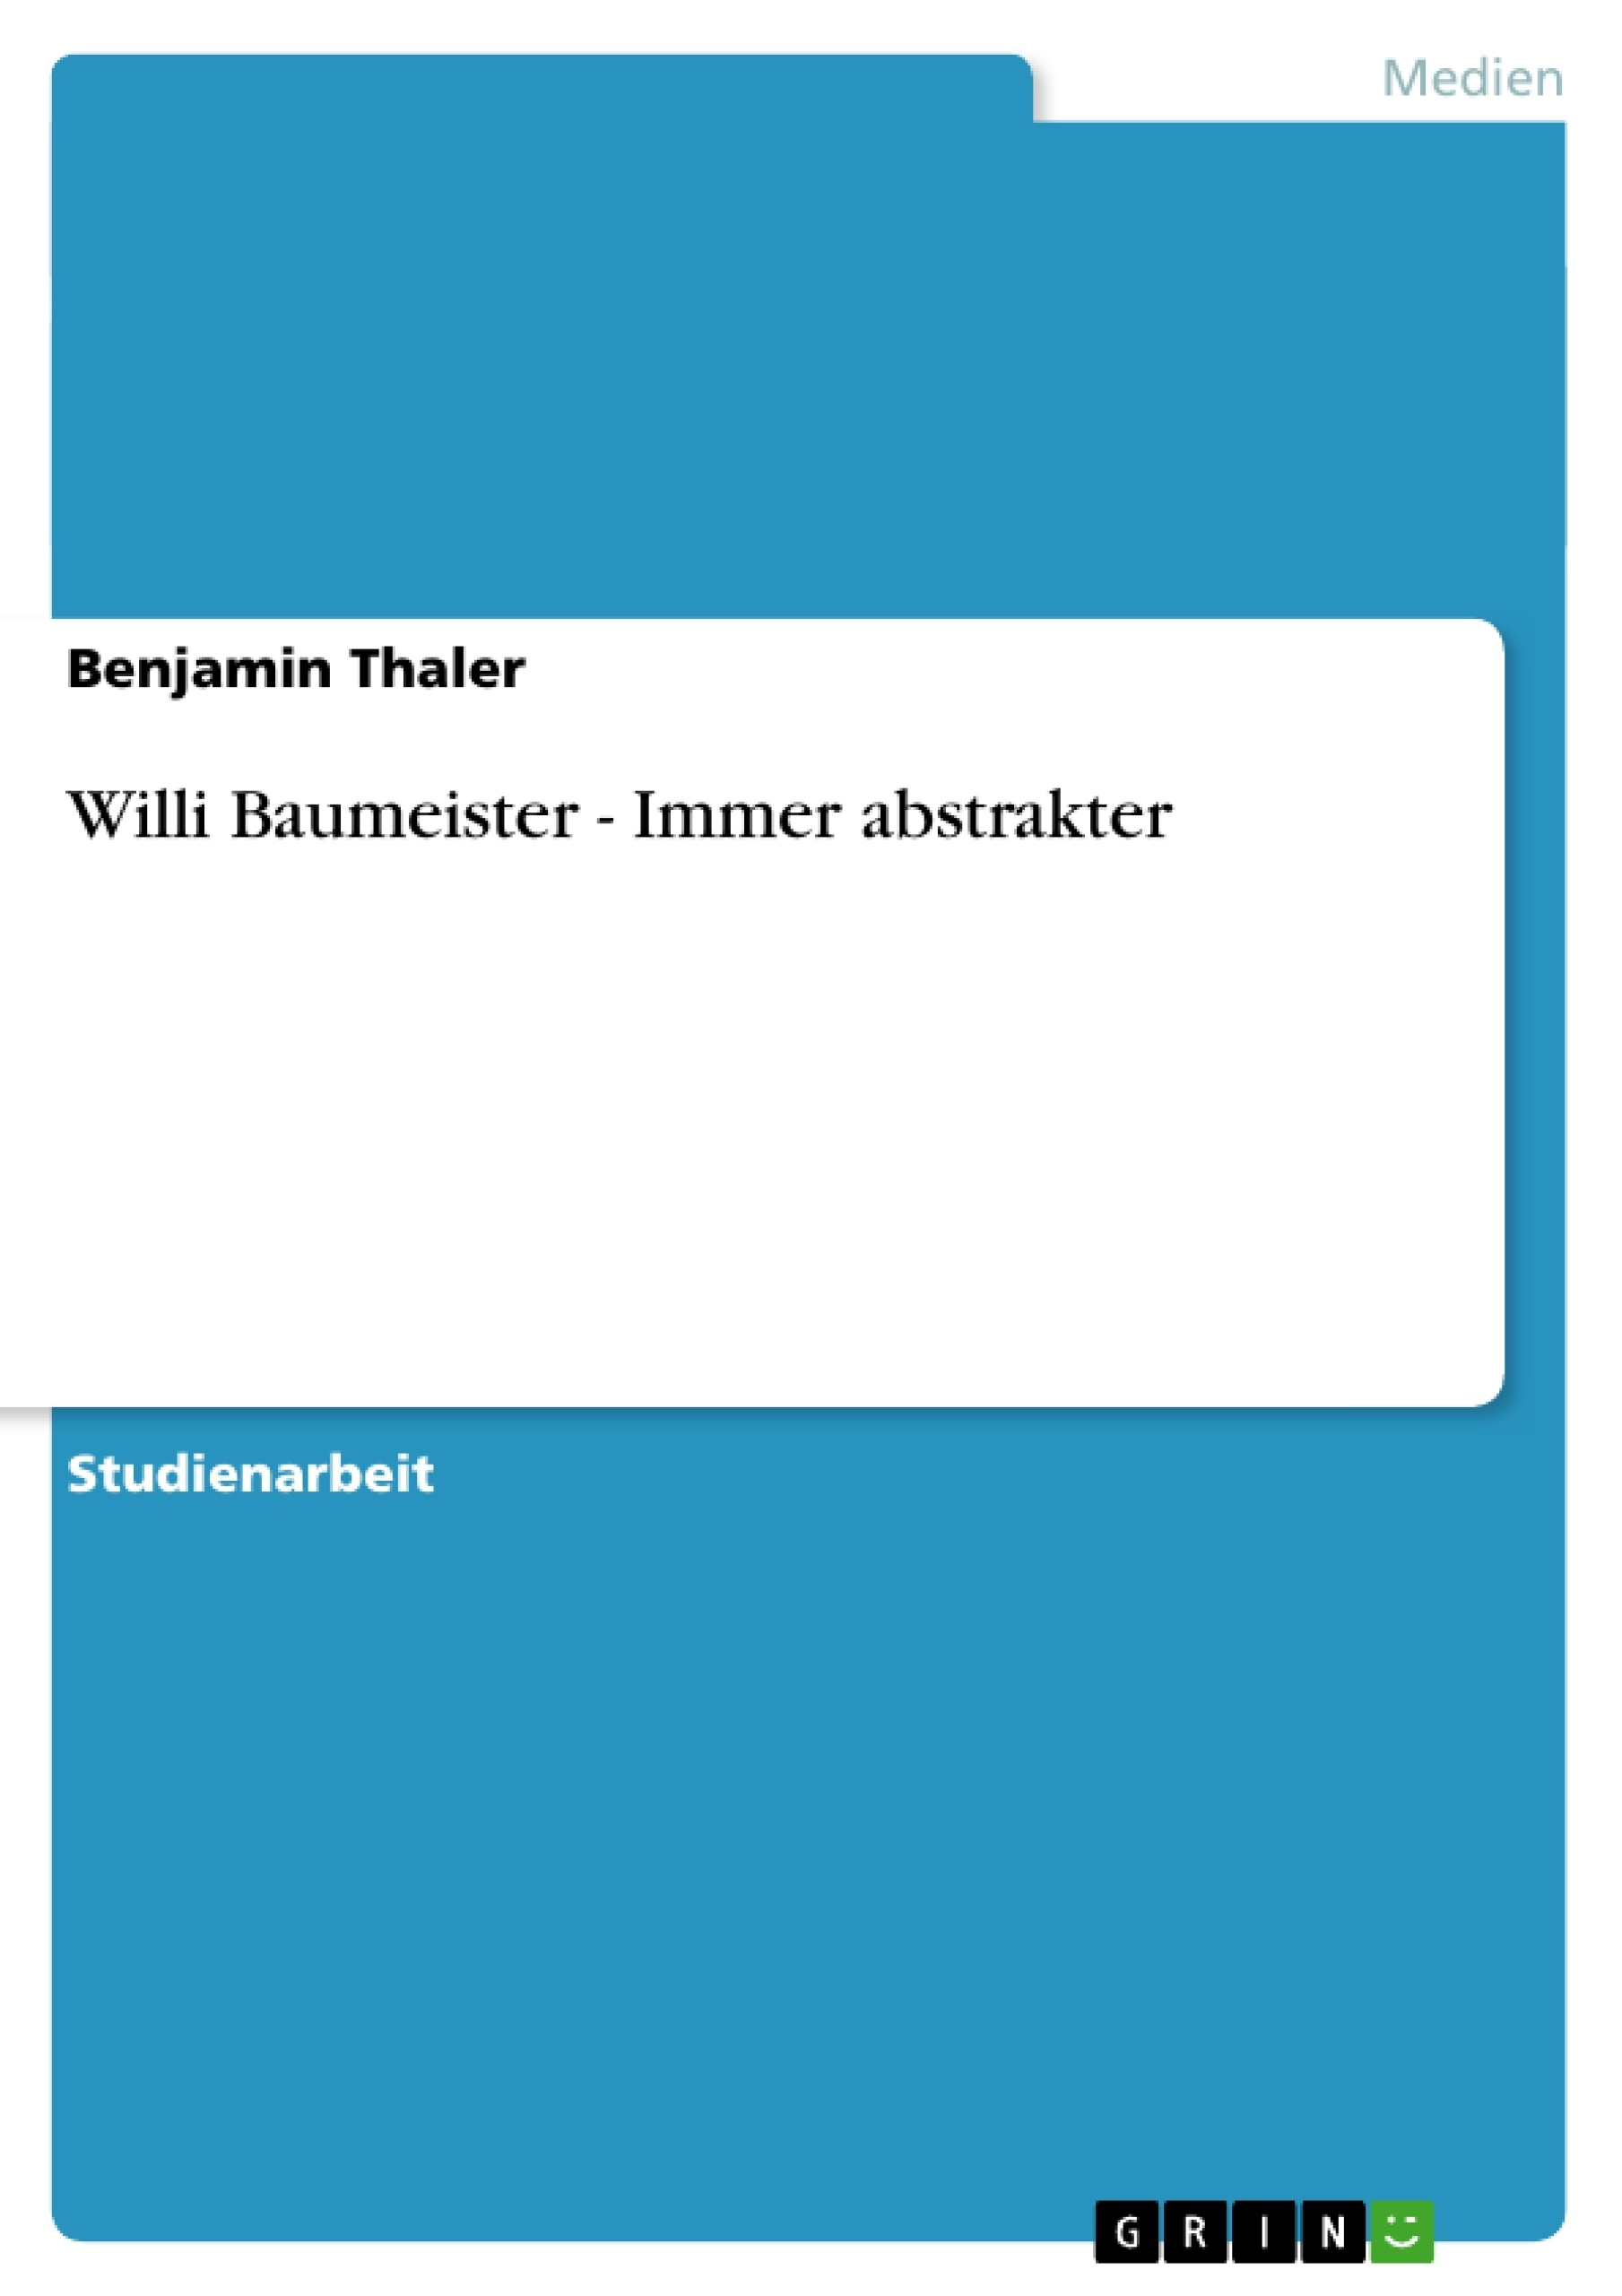 Titel: Willi Baumeister - Immer abstrakter